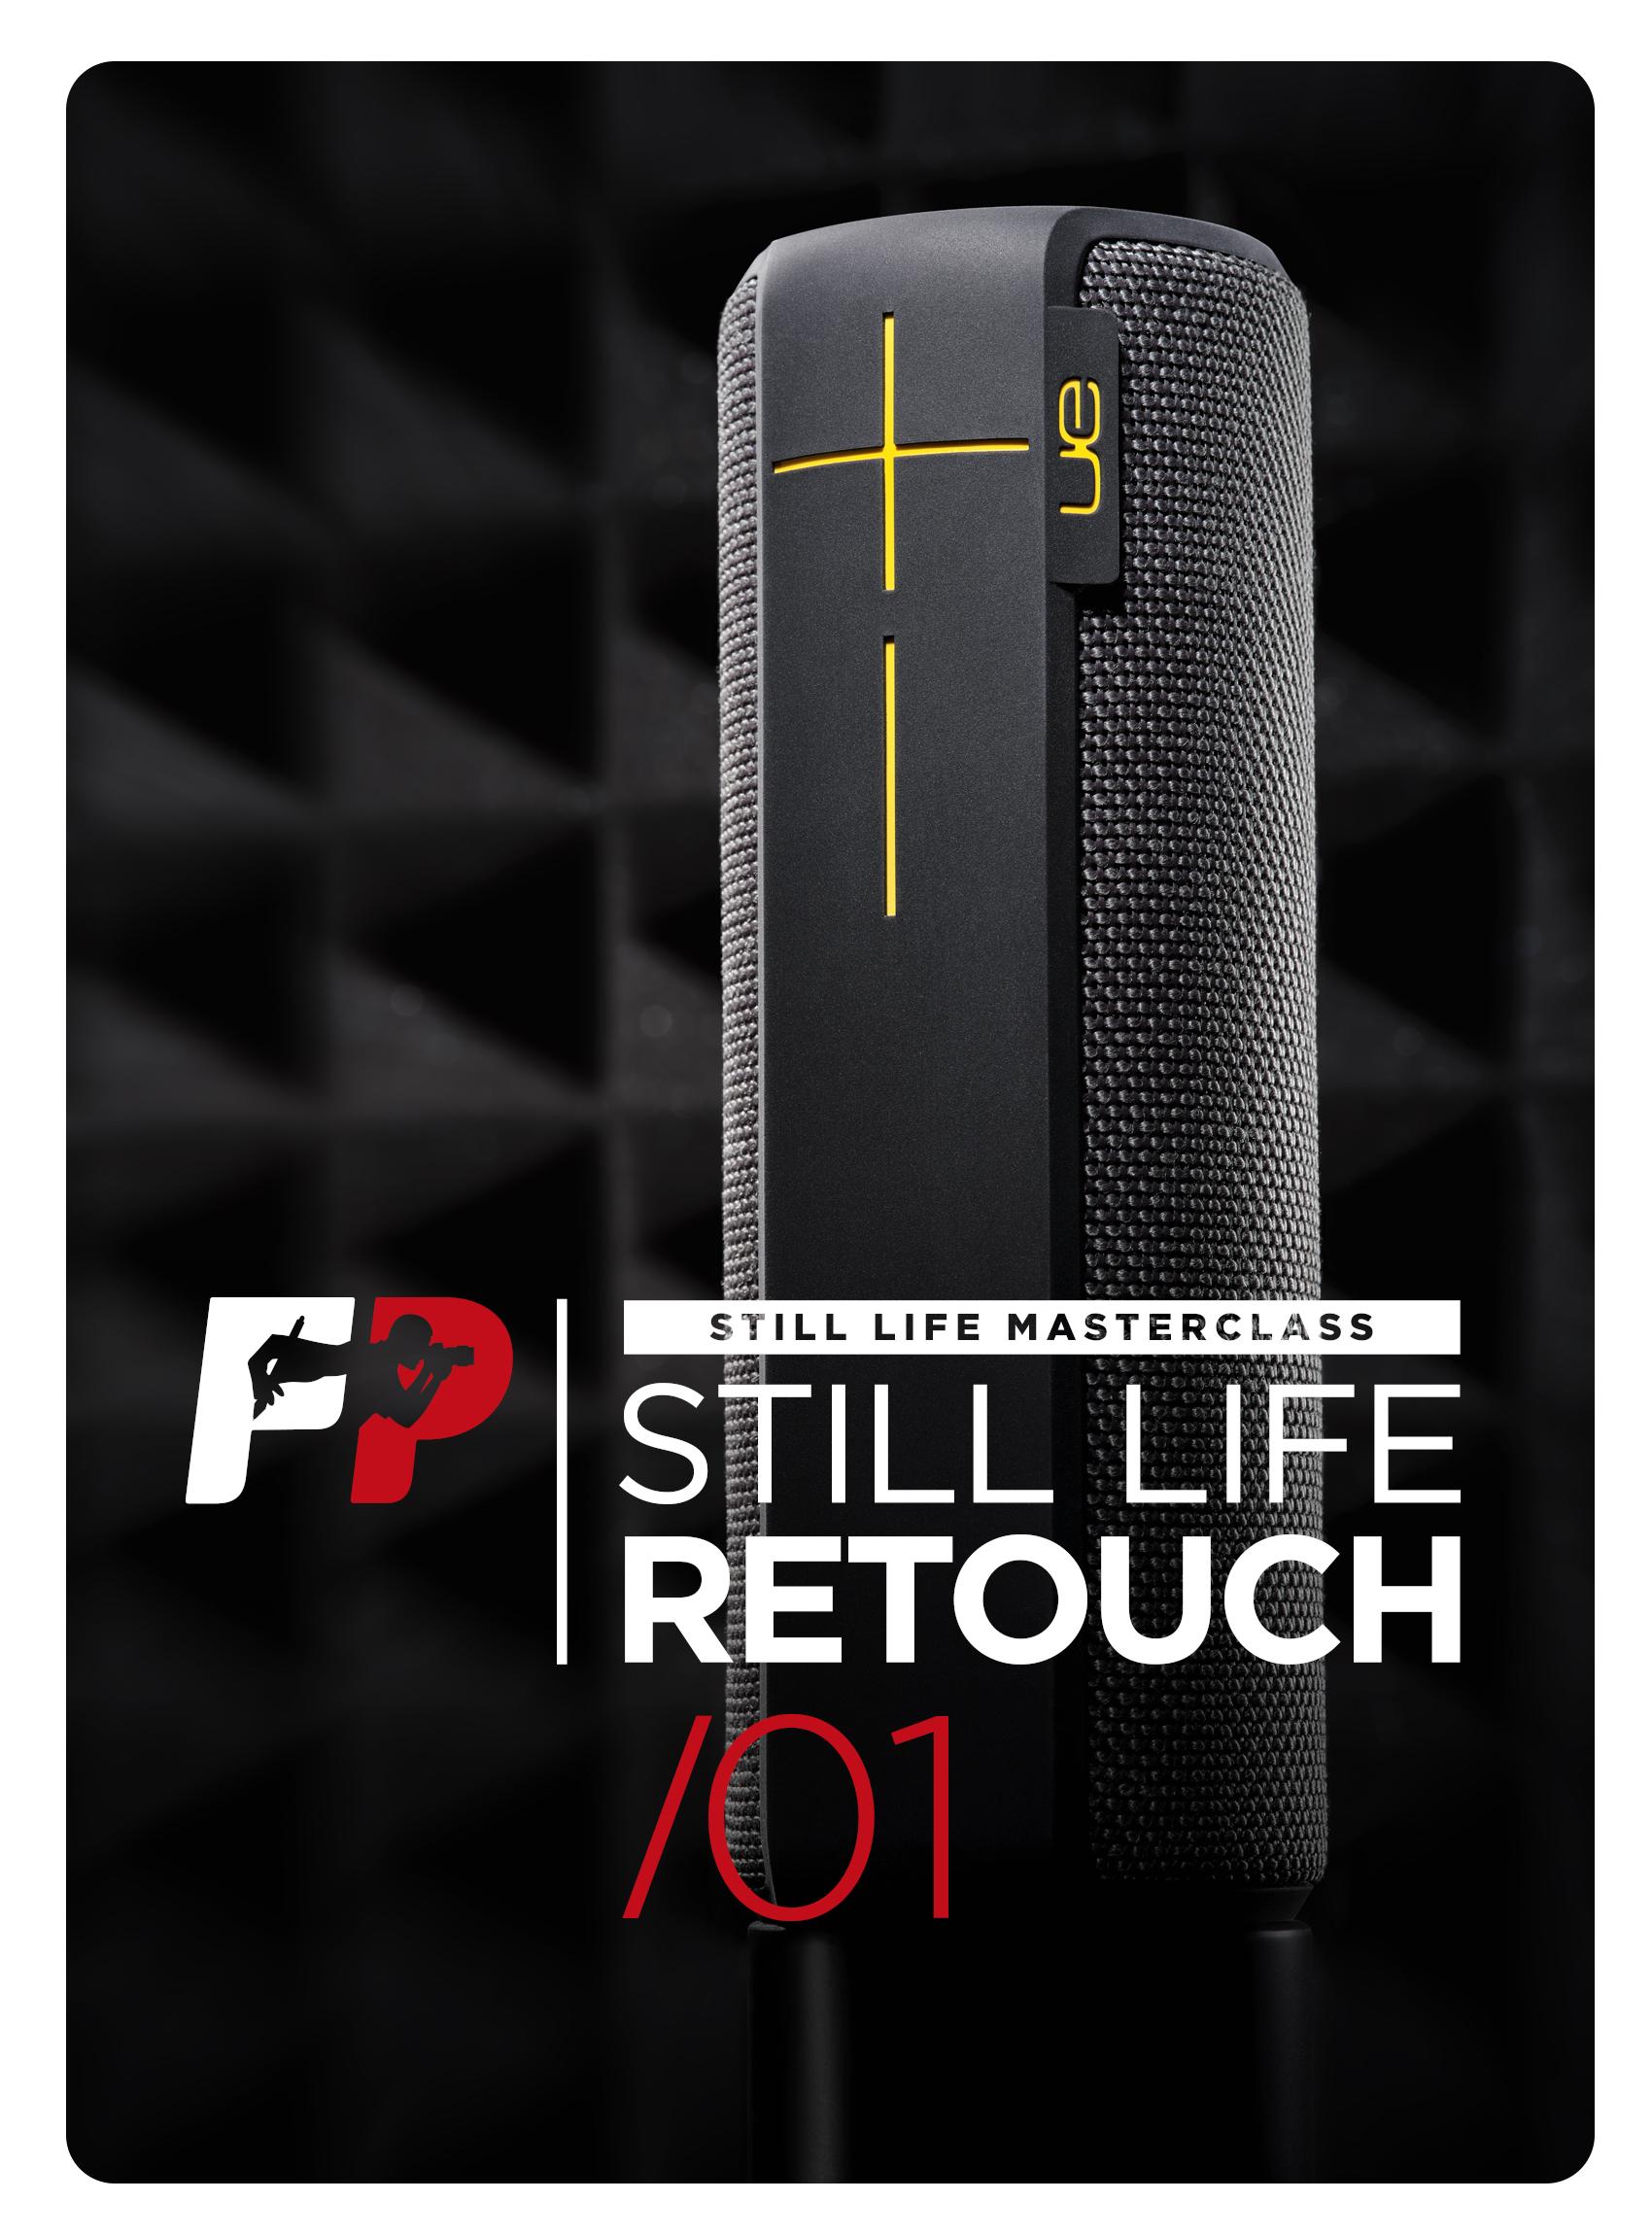 Still Life Retouch LEVEL 01